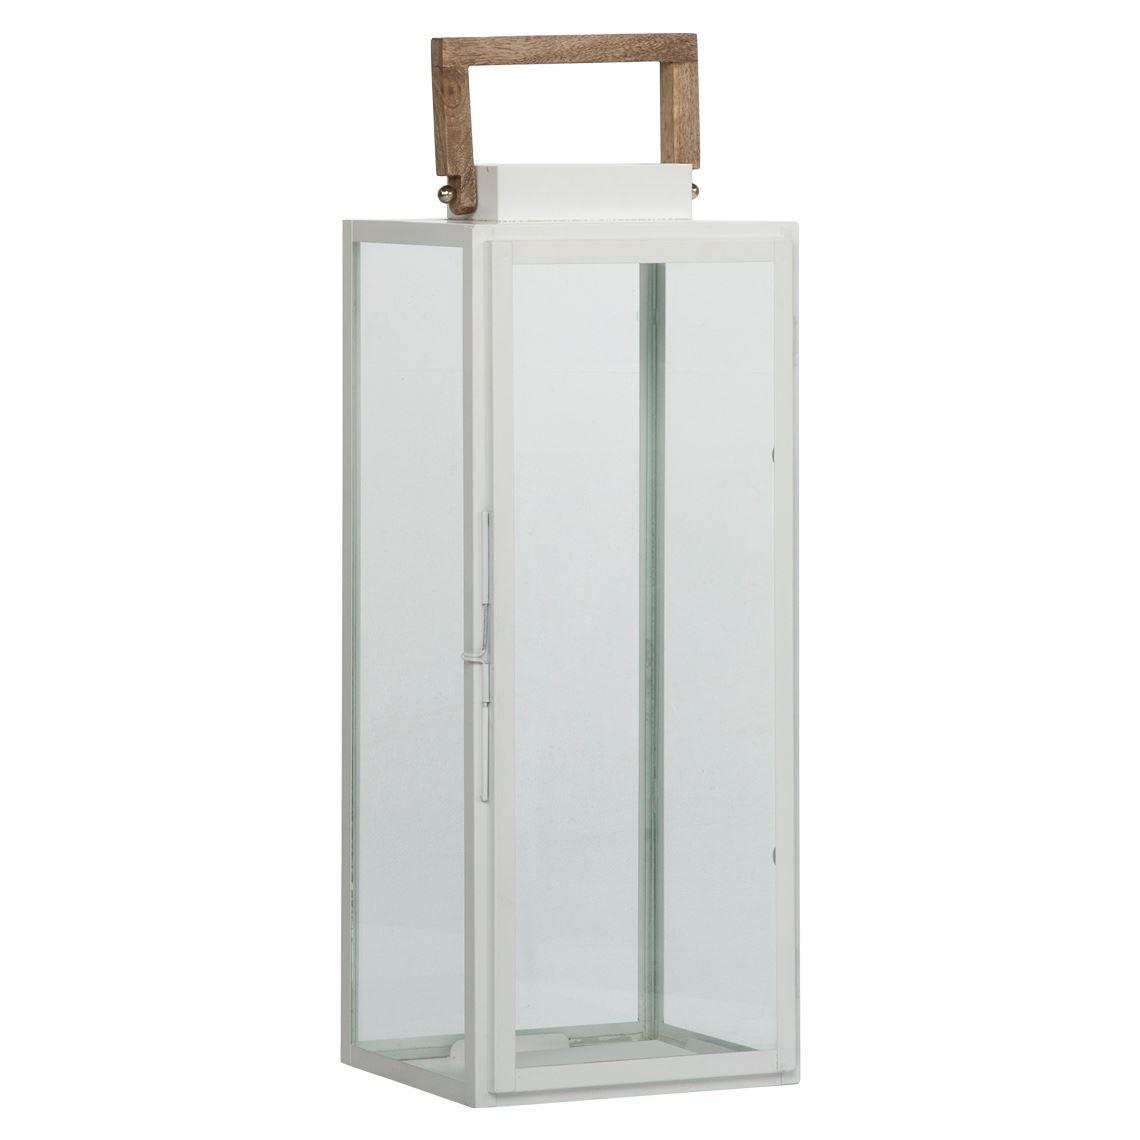 Marella Lantern Size W 21cm x D 17cm x H 53cm in White Freedom